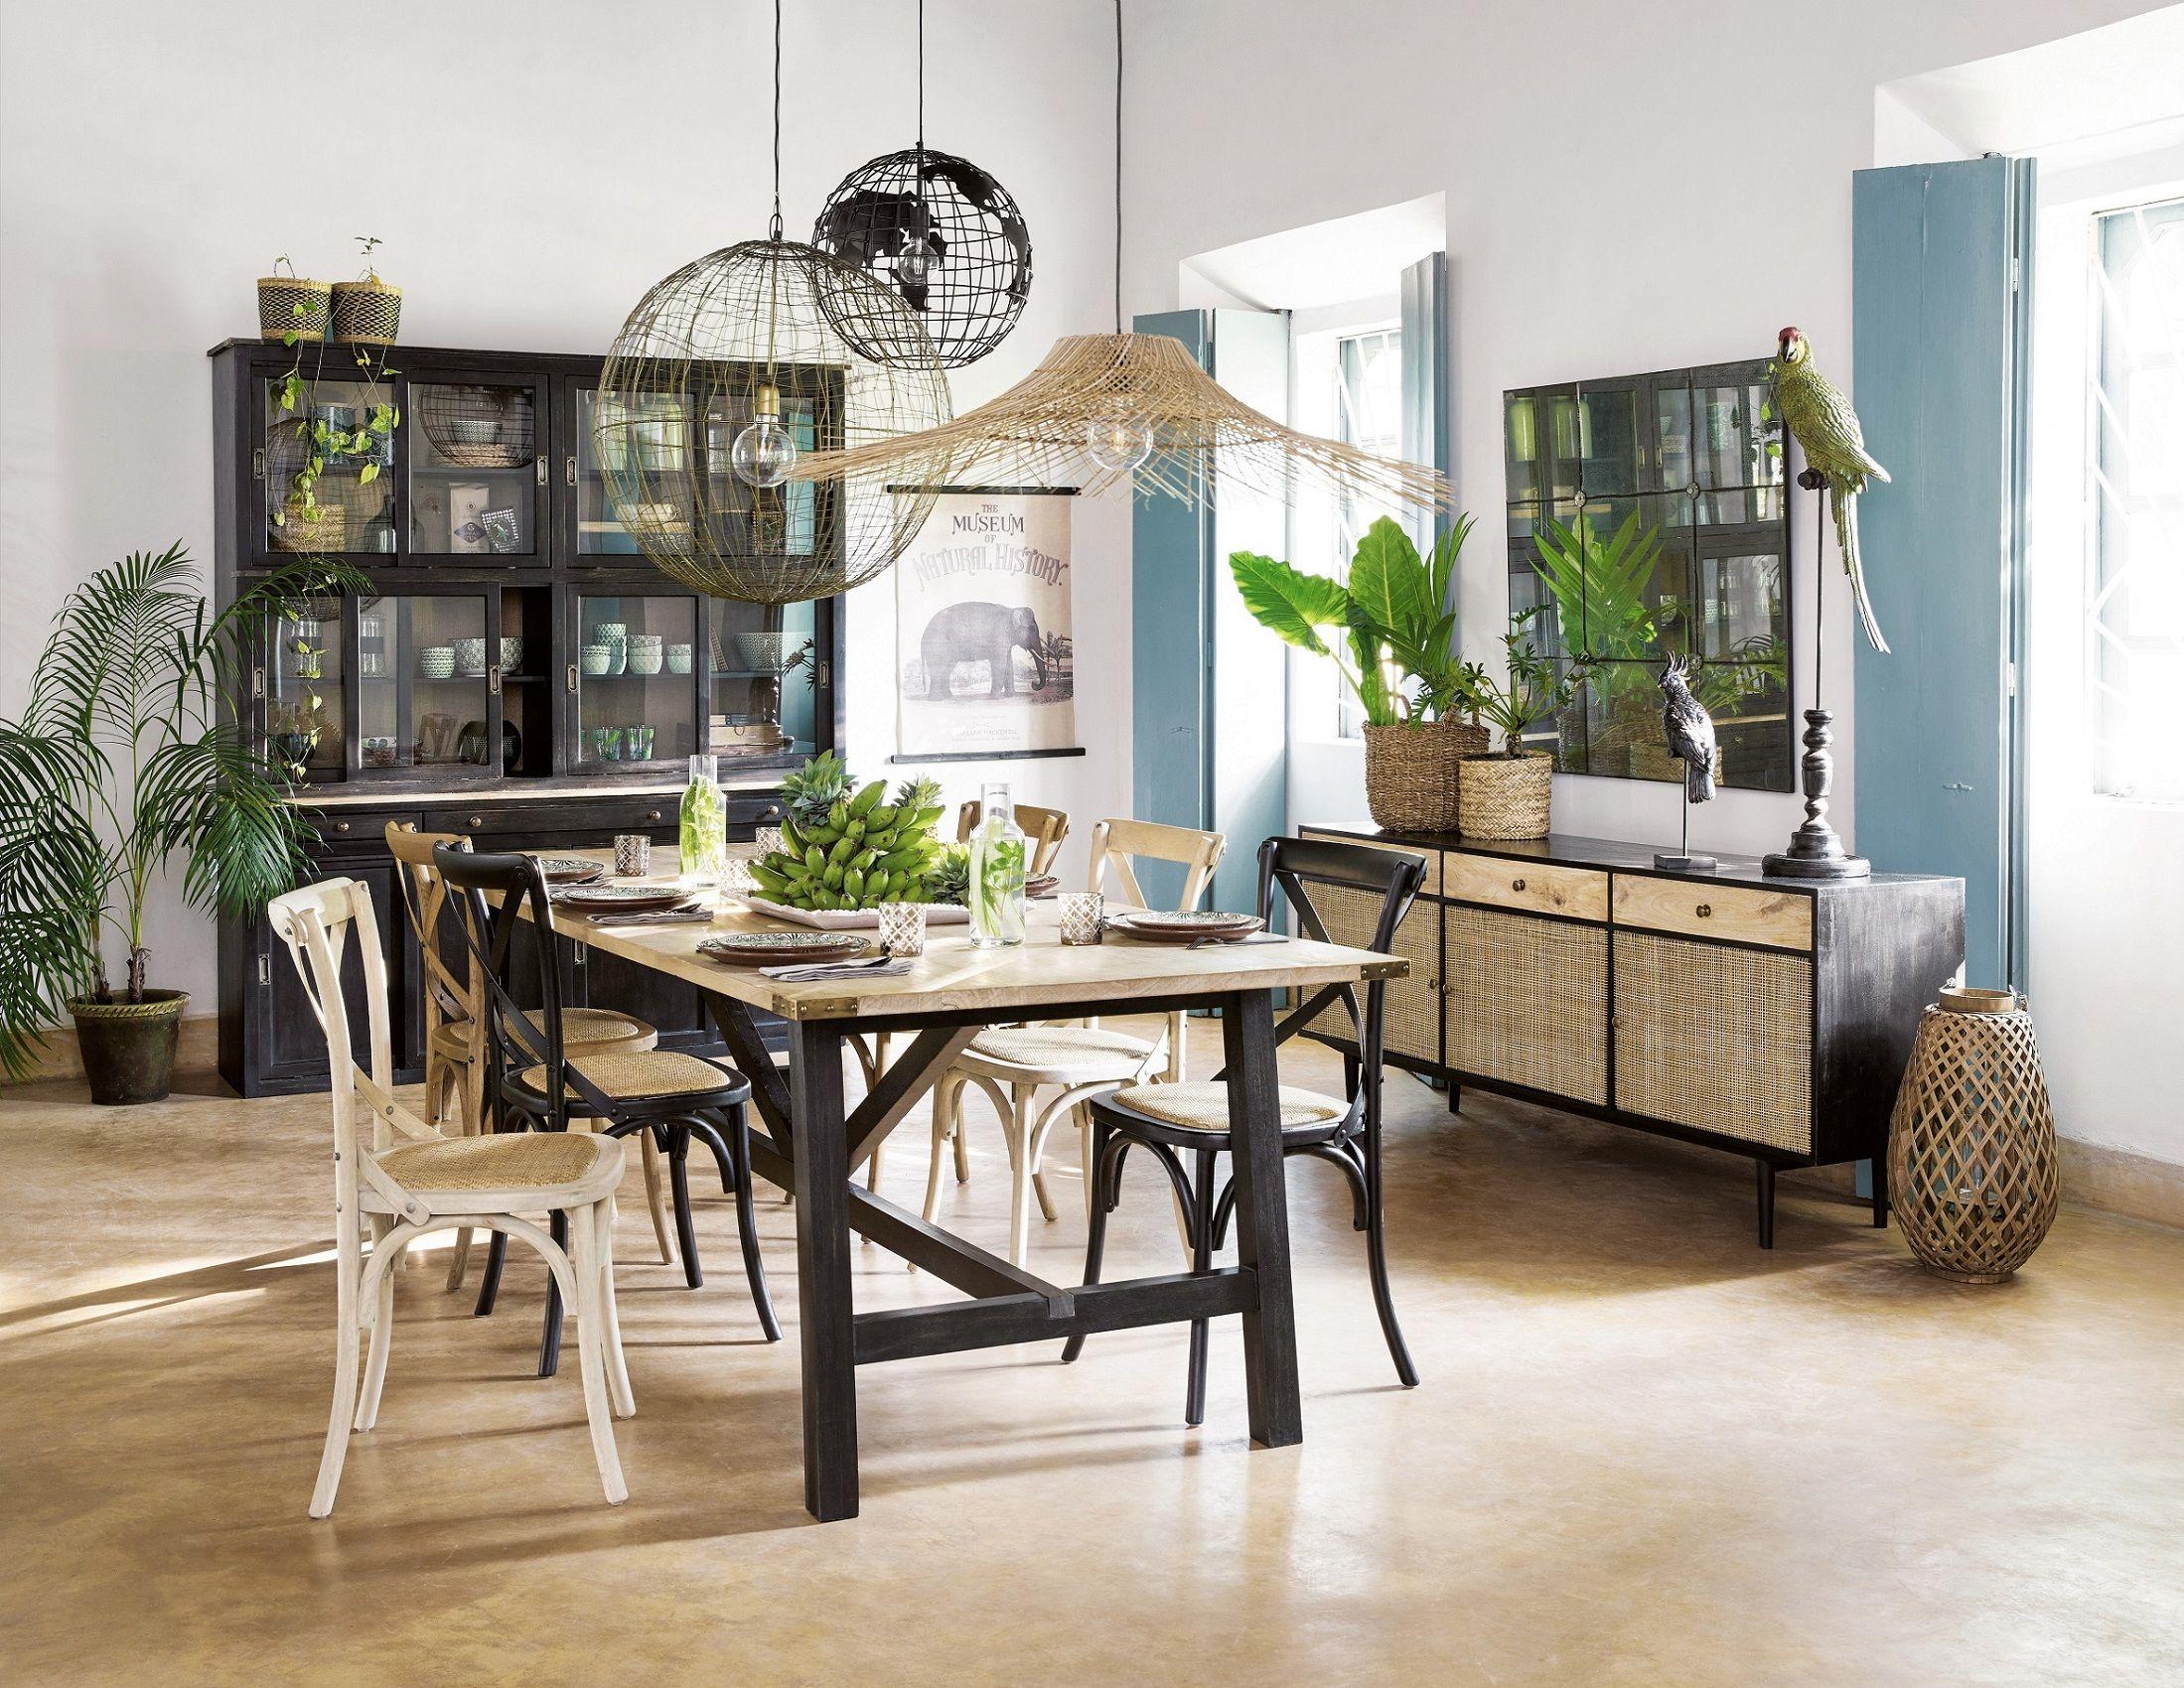 Chesterfield Maison Du Monde debenhams furniture – fashion dresses